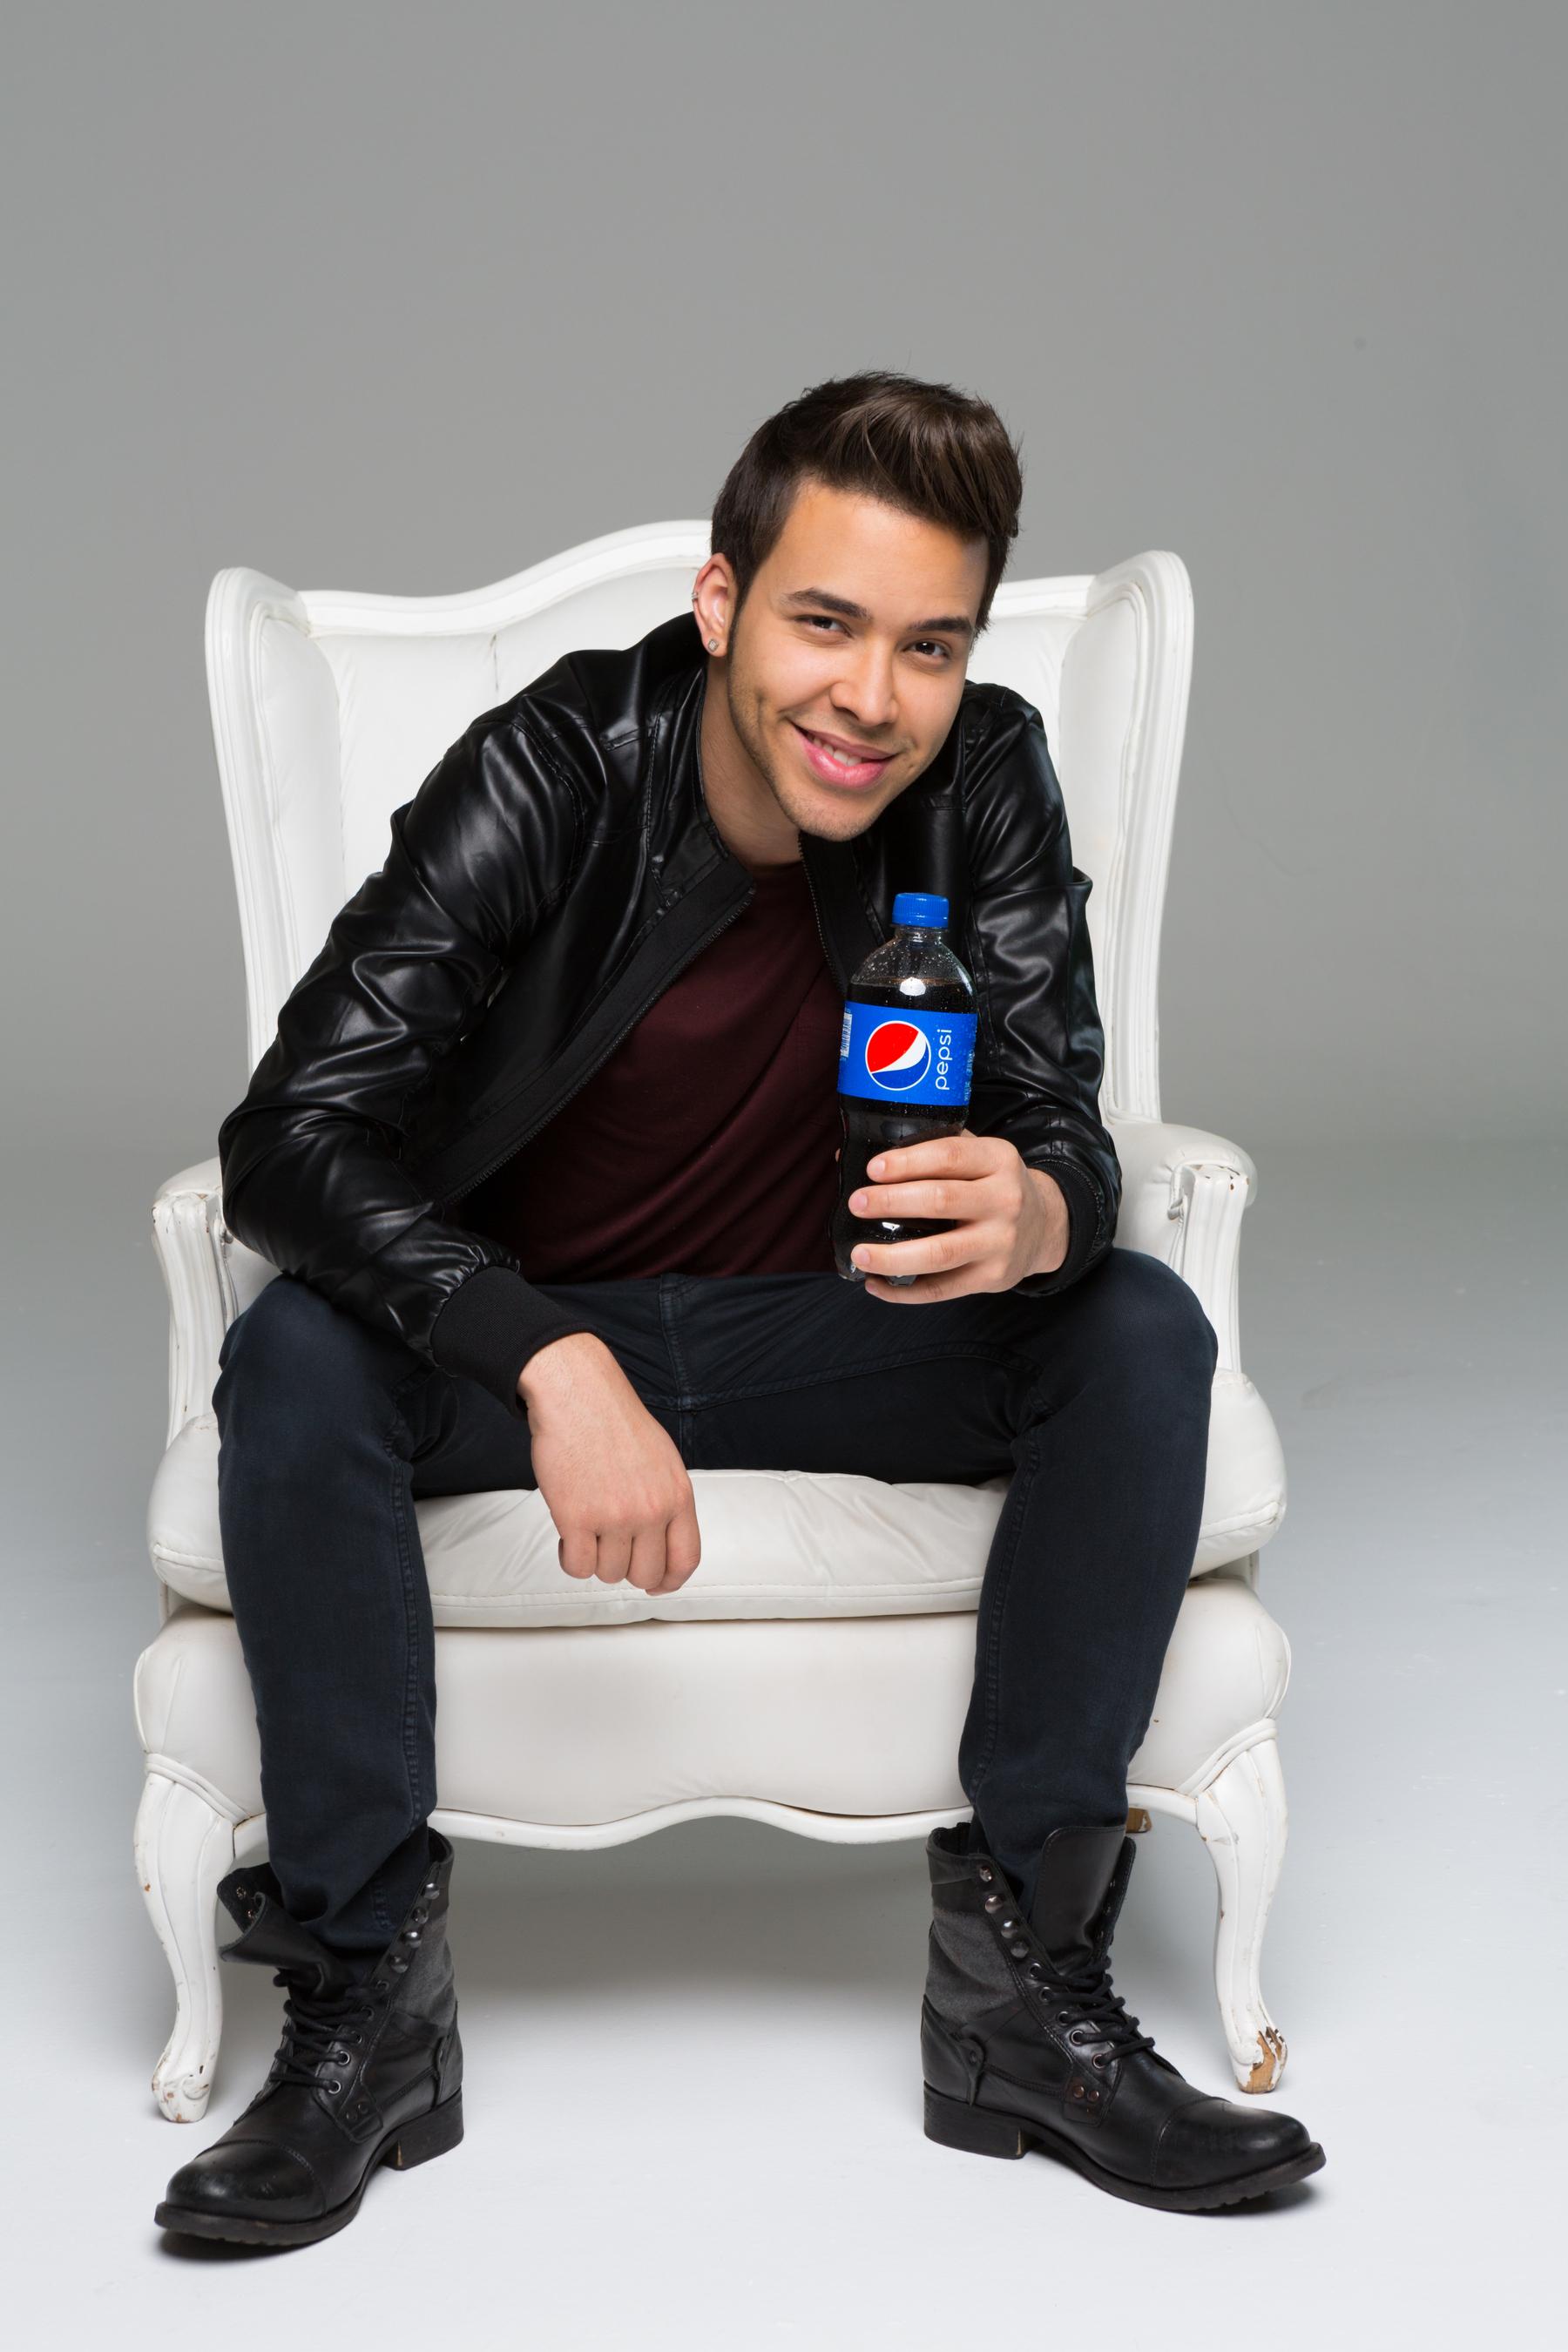 Pepsi Announces Music Partnership With Prince Royce